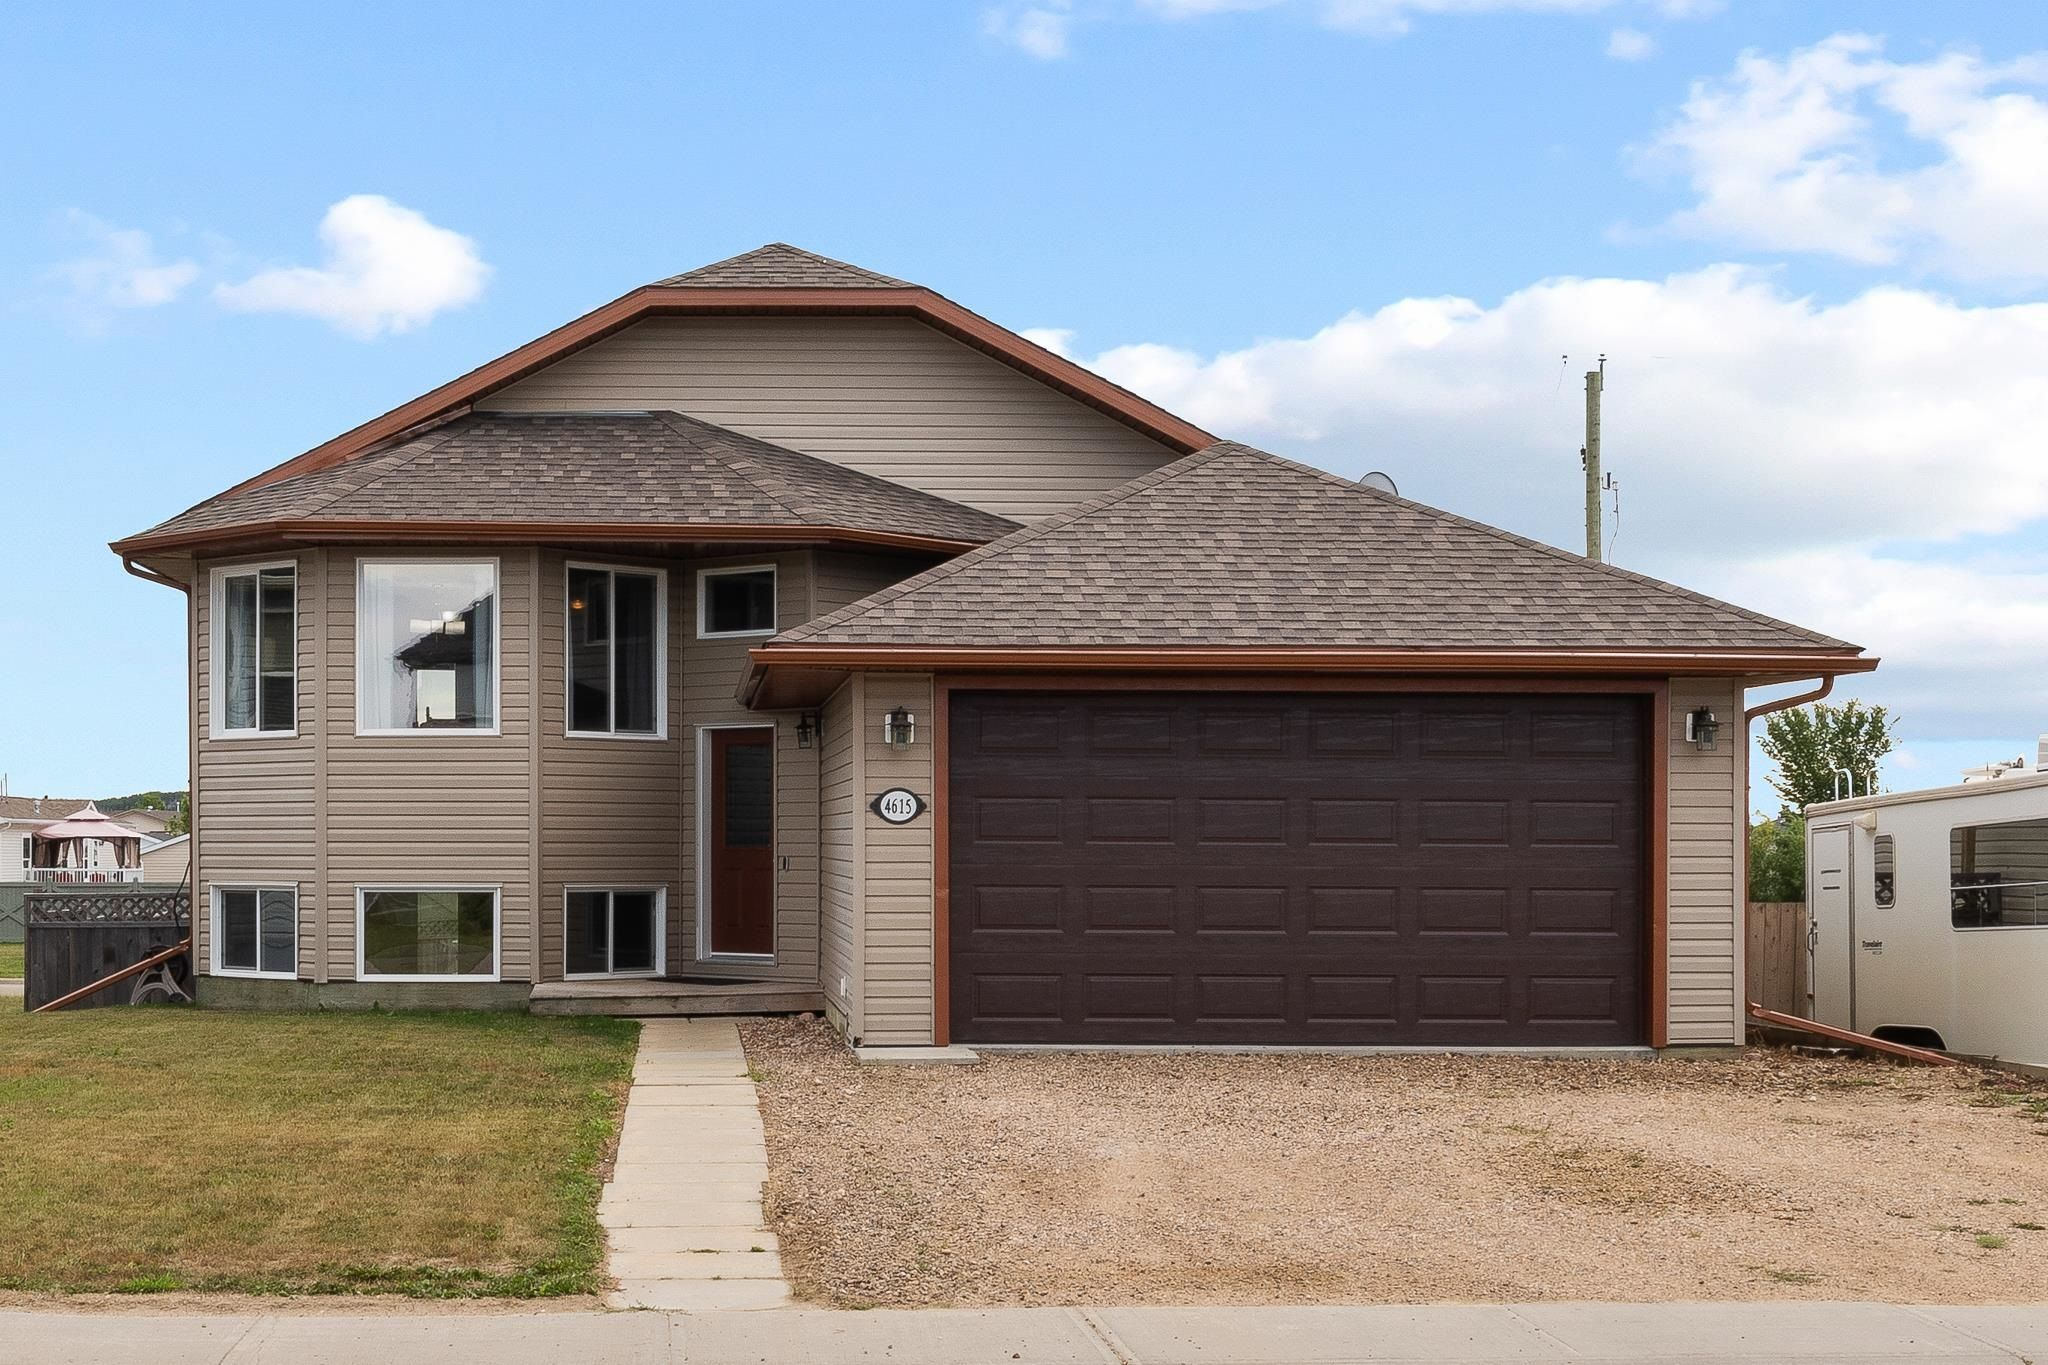 Main Photo: 4615 62 Avenue: Cold Lake House for sale : MLS®# E4258692